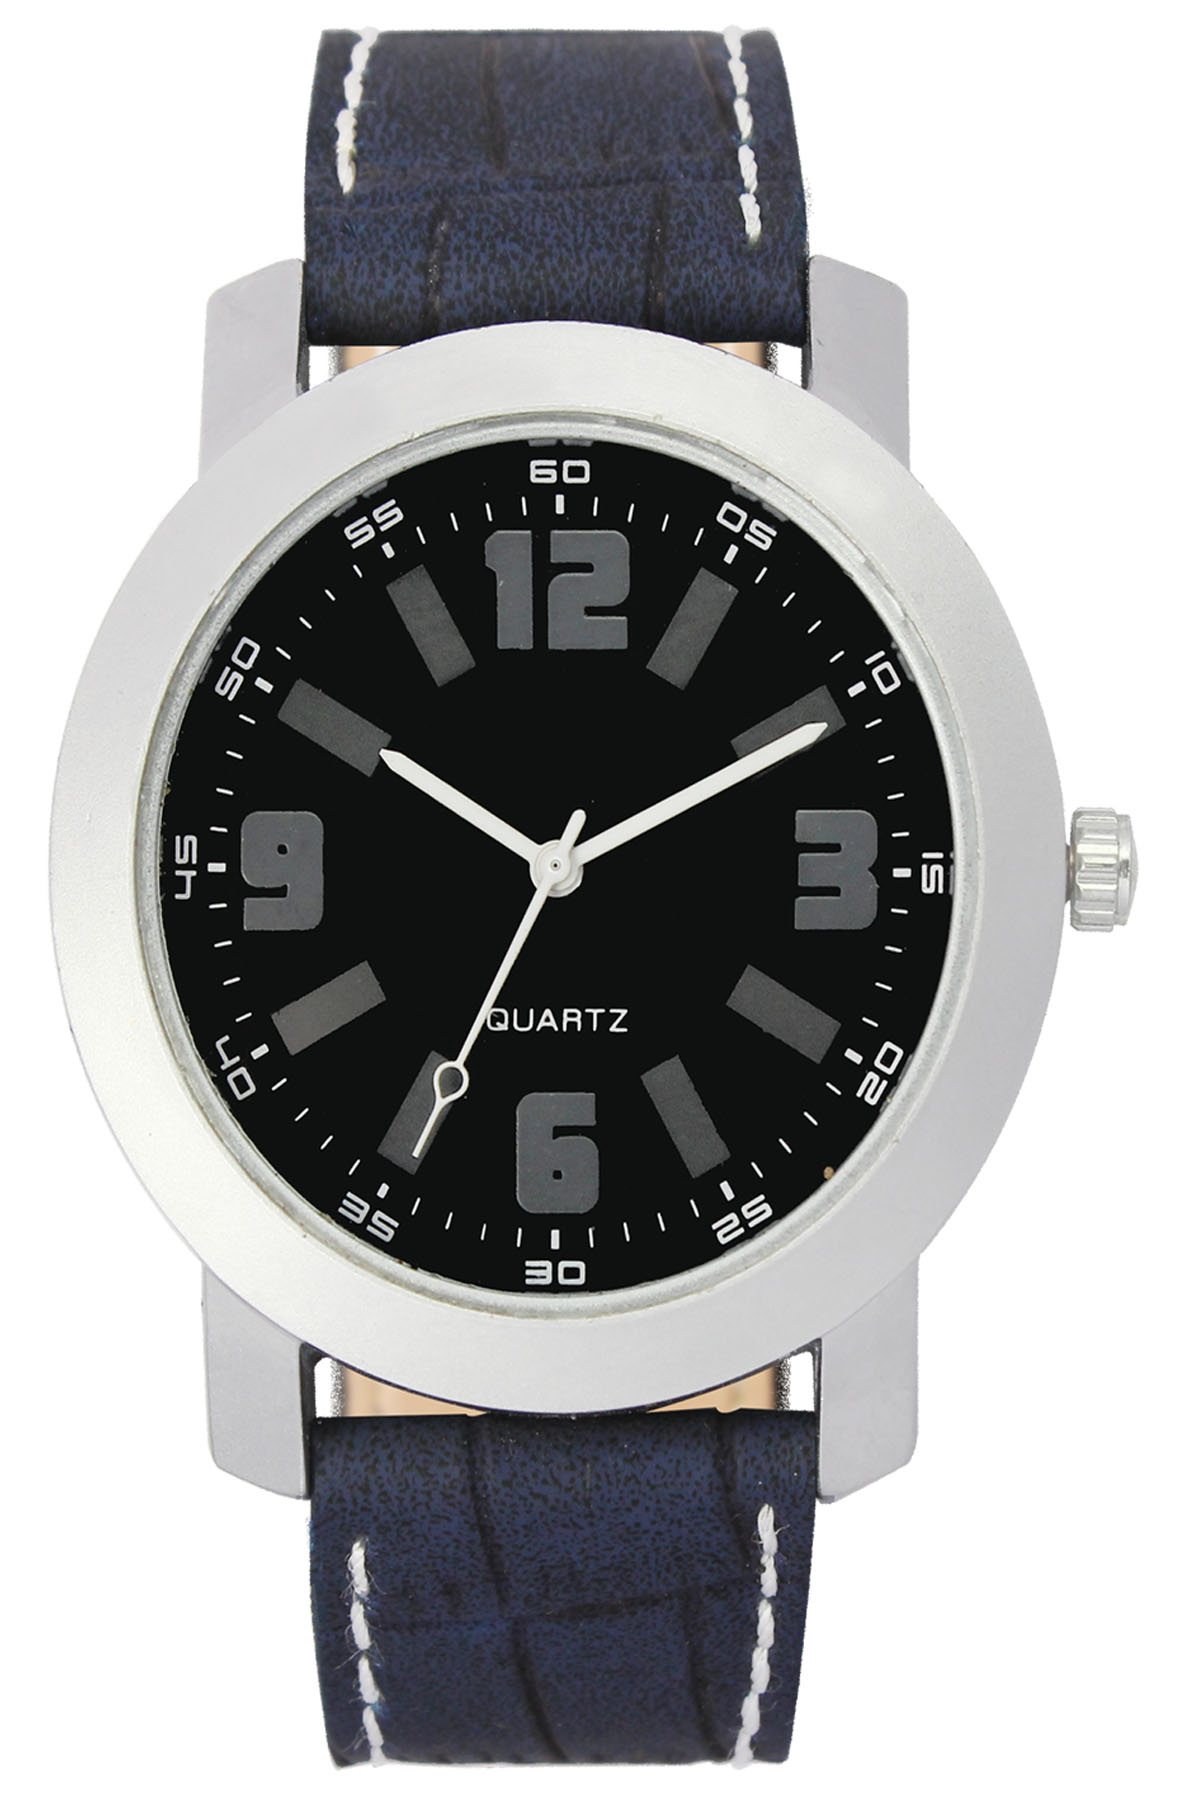 parienterprise Mens Watch Premium 40mm Black Round Dial Black Leather Strap And White Storm Mens Analog Watch 126